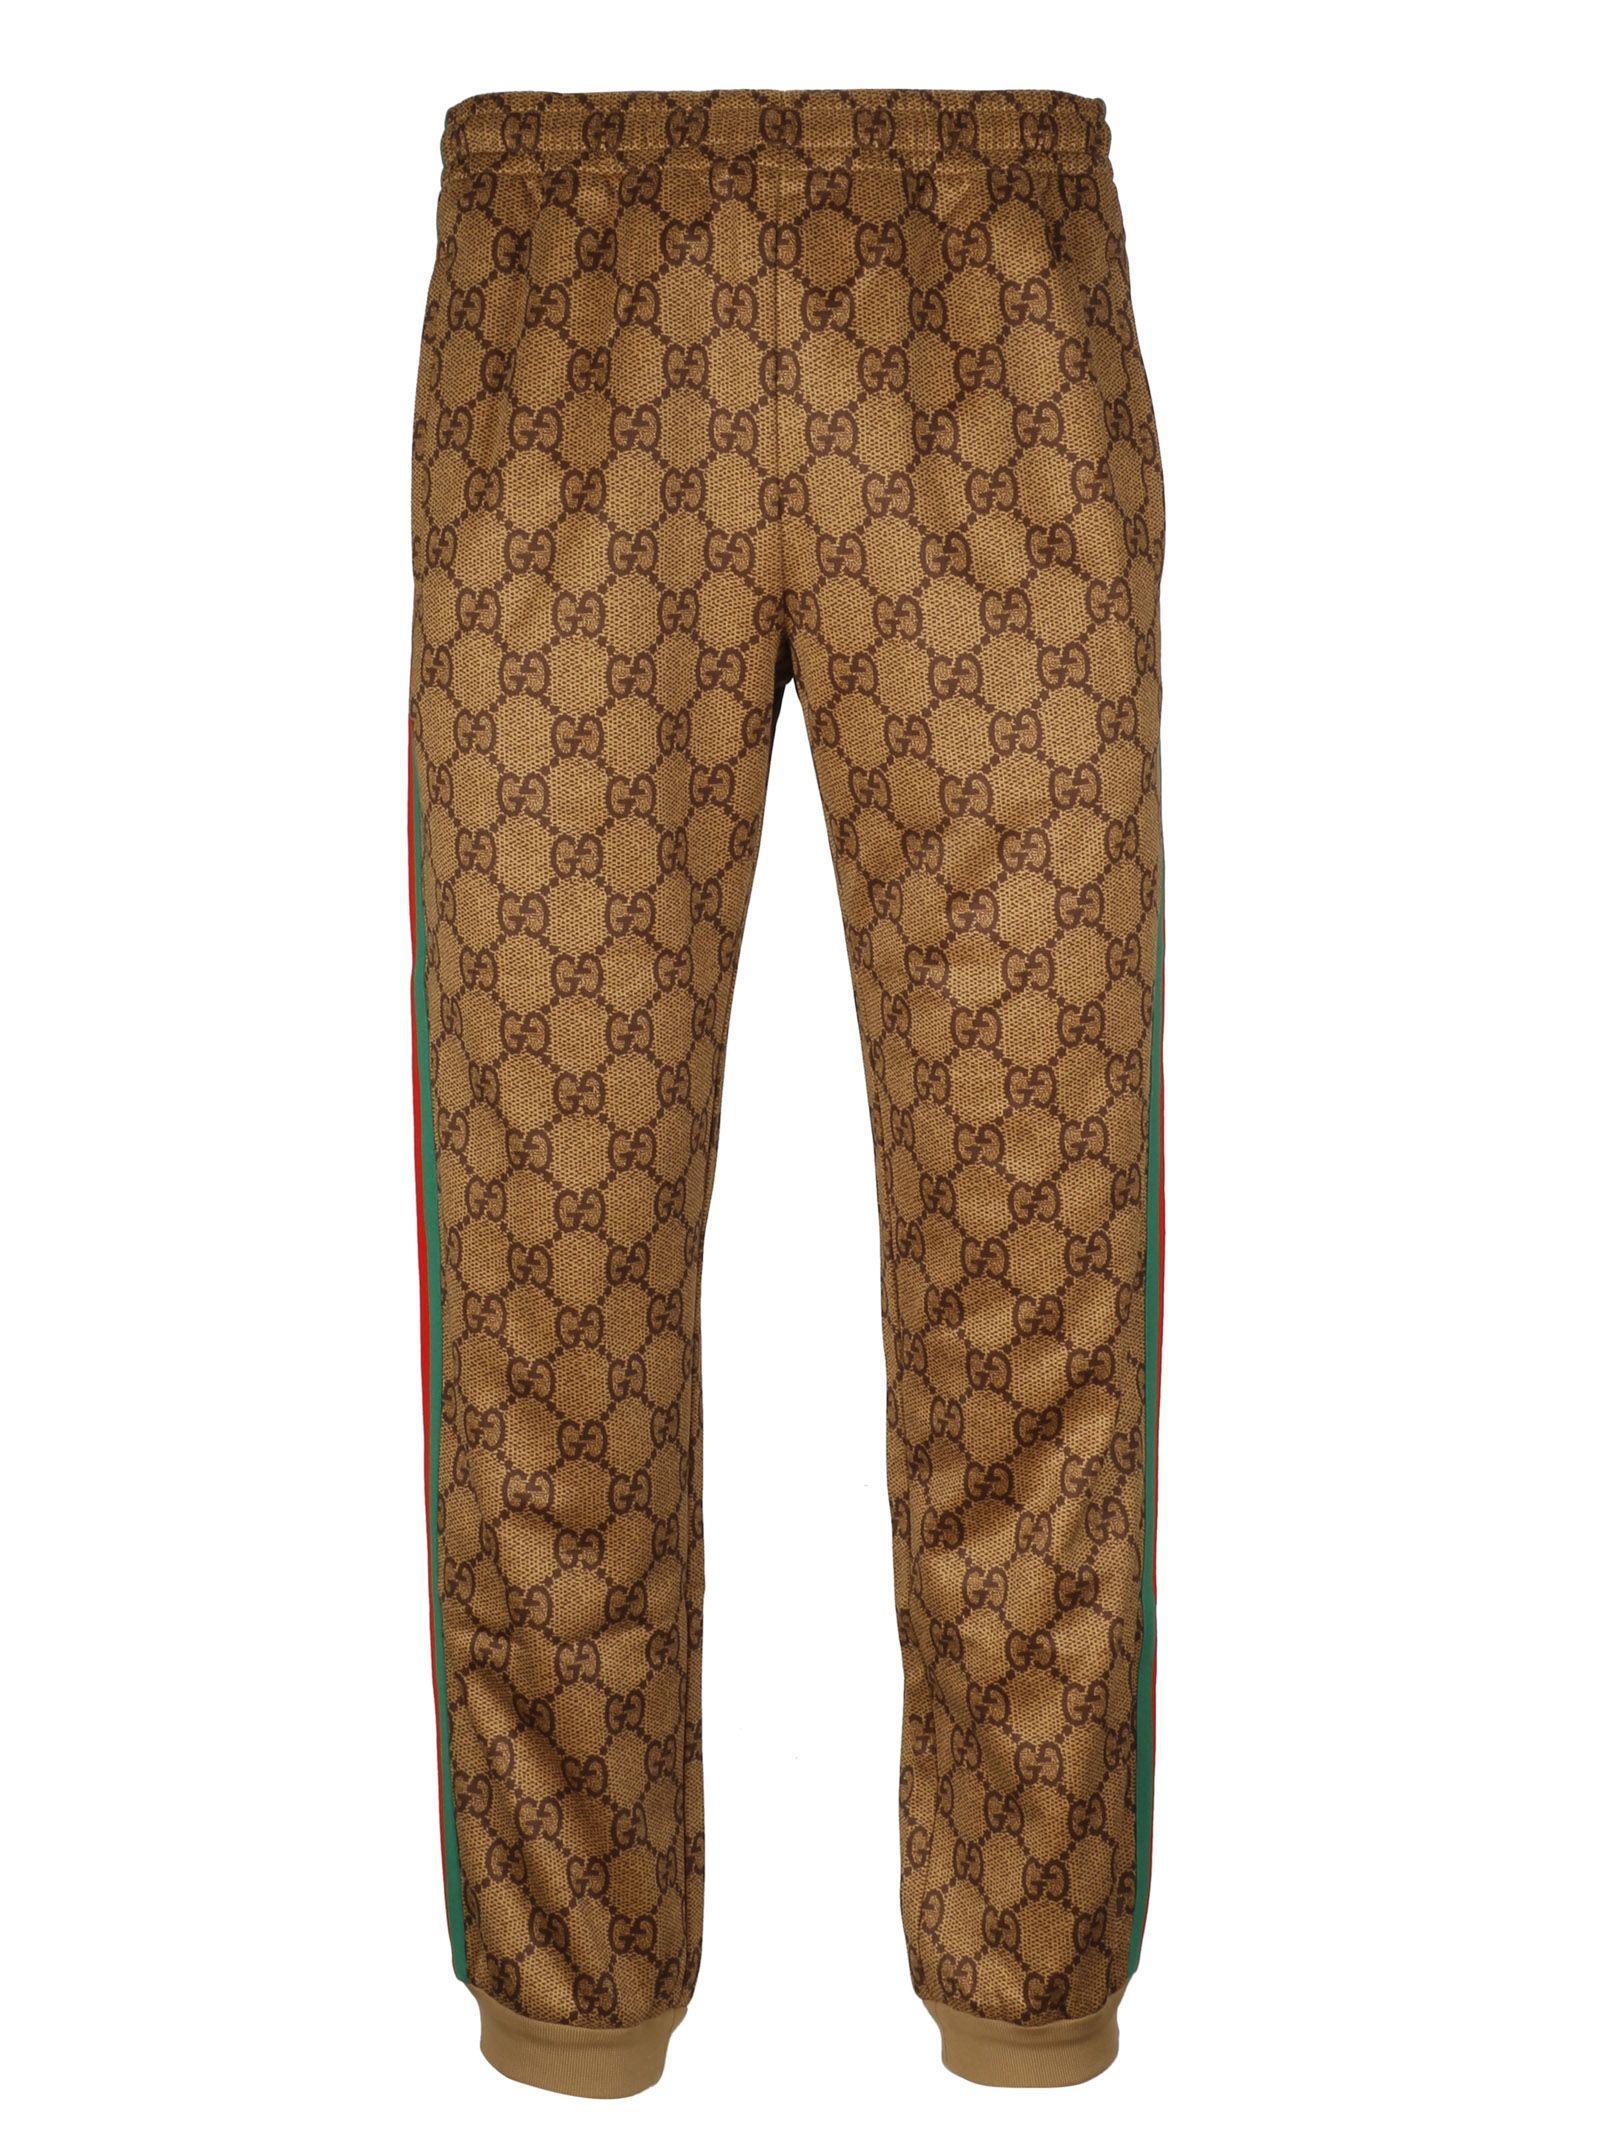 Gucci Gg Supreme Track Pants In 2035